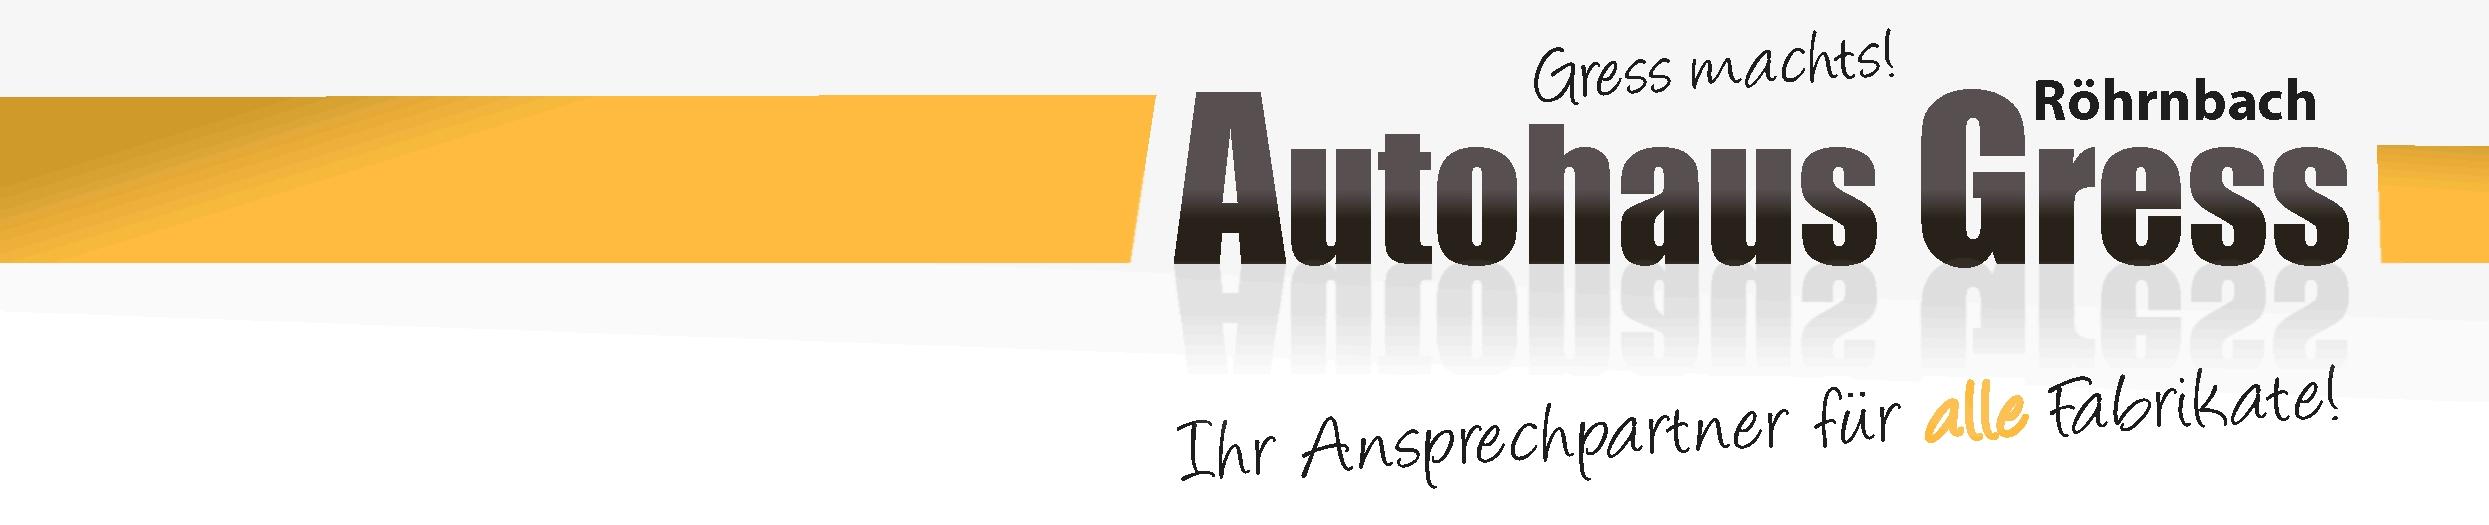 www.autohaus-gress.de